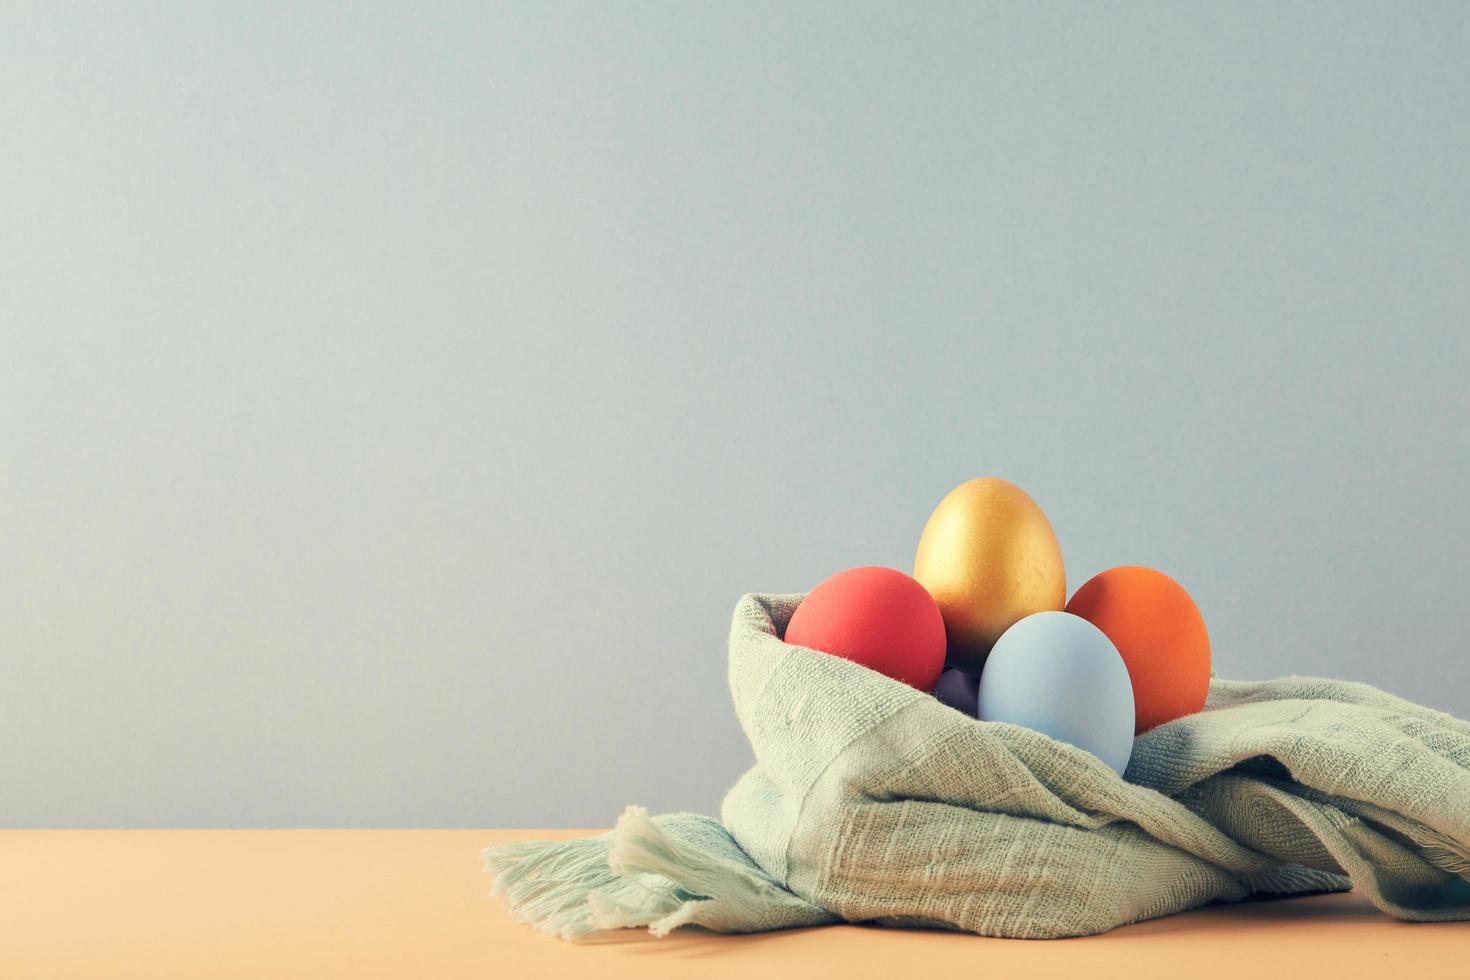 huevos de pascua en tela foto